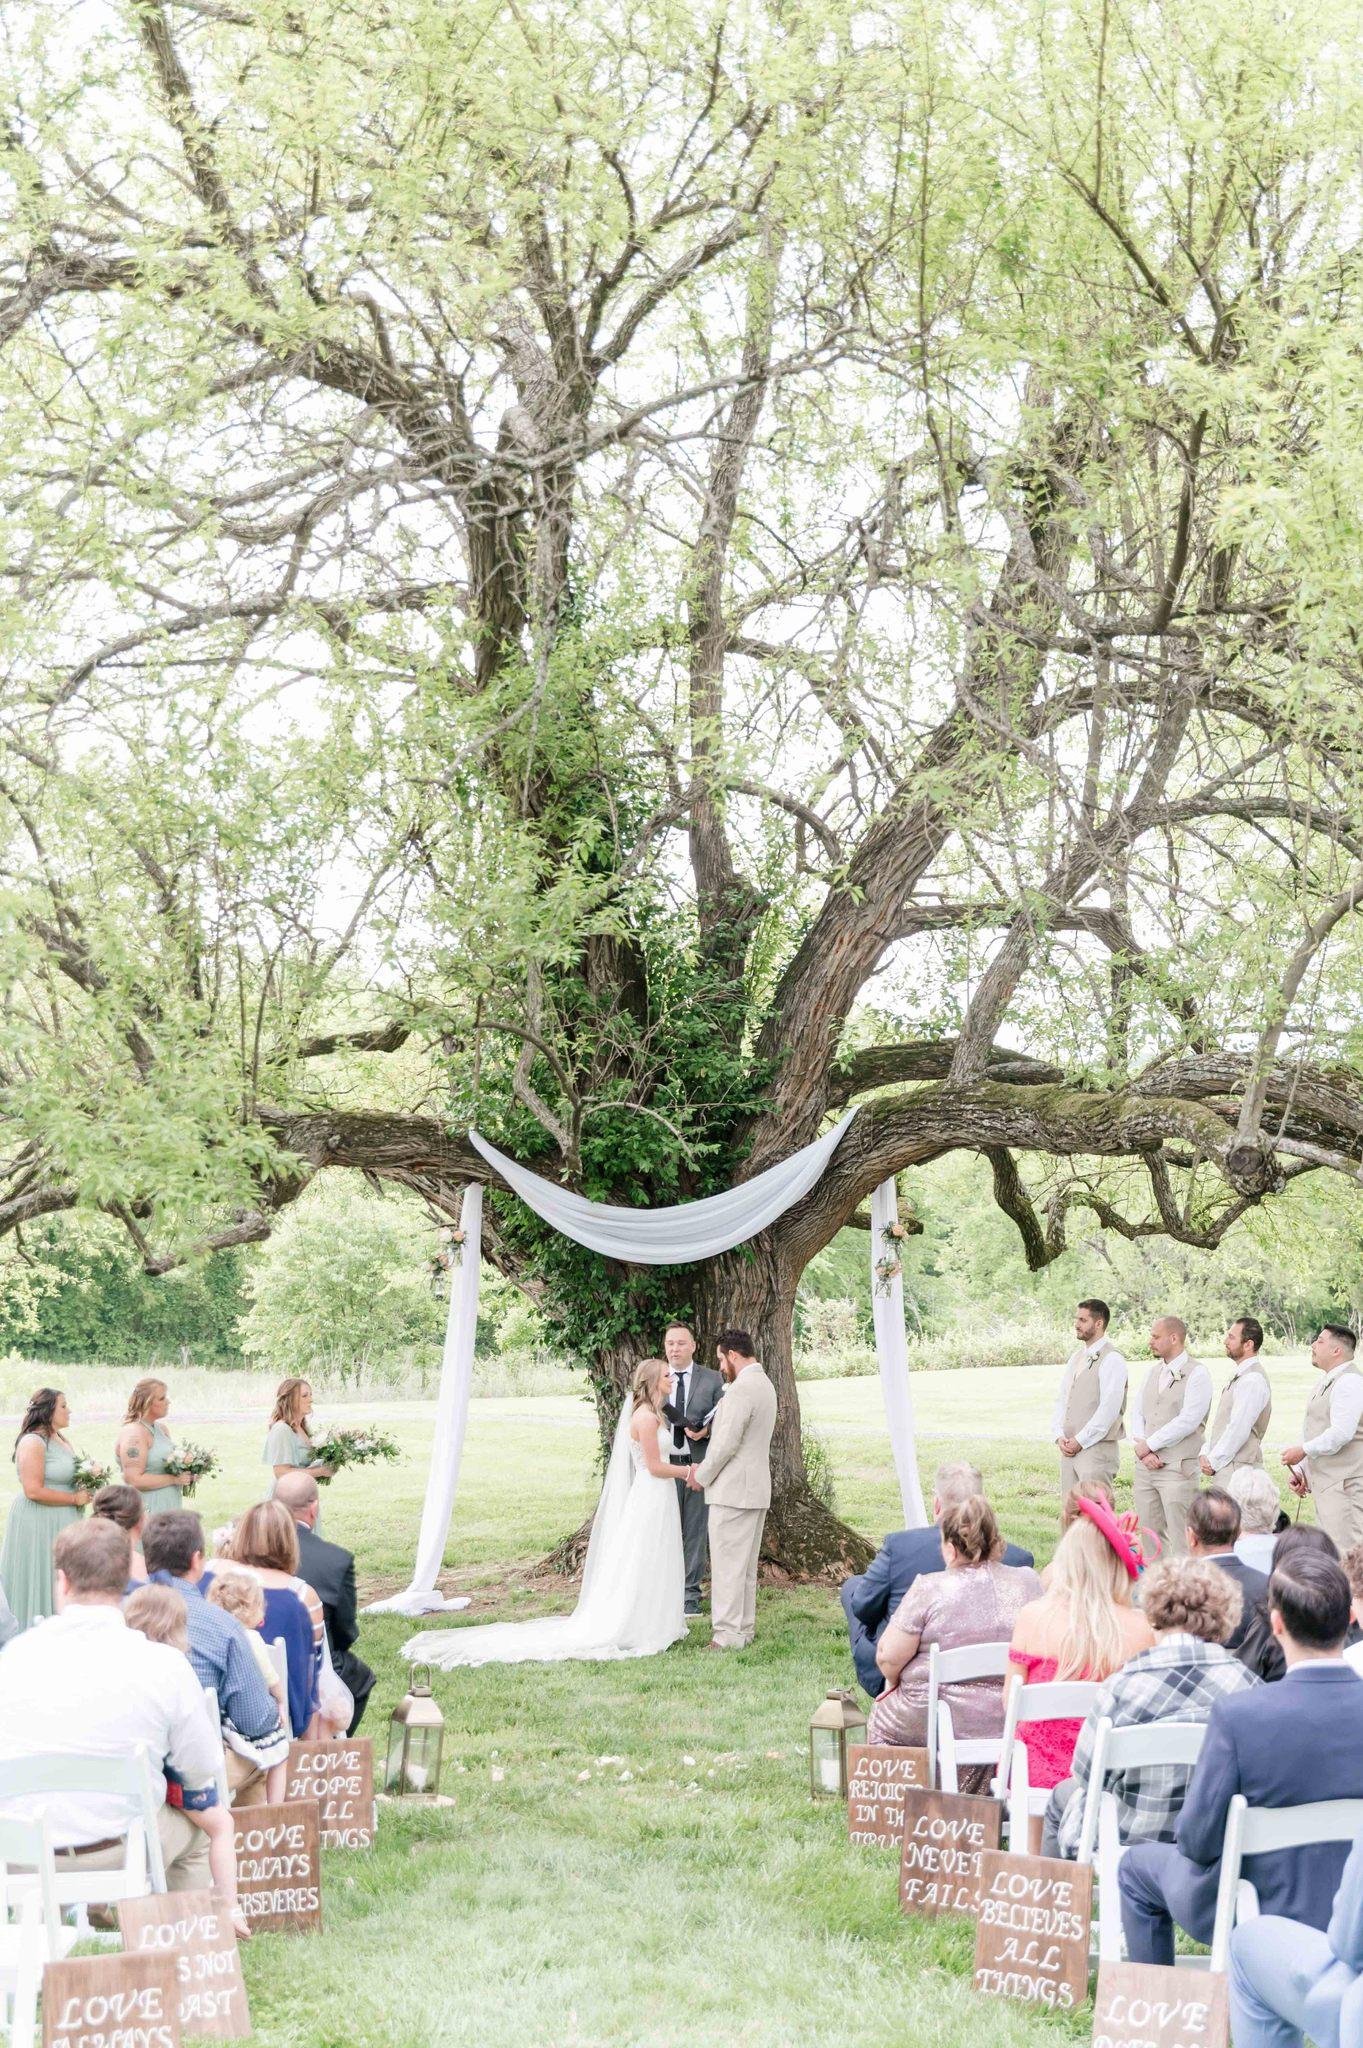 Briar Rose Hill wedding ceremony